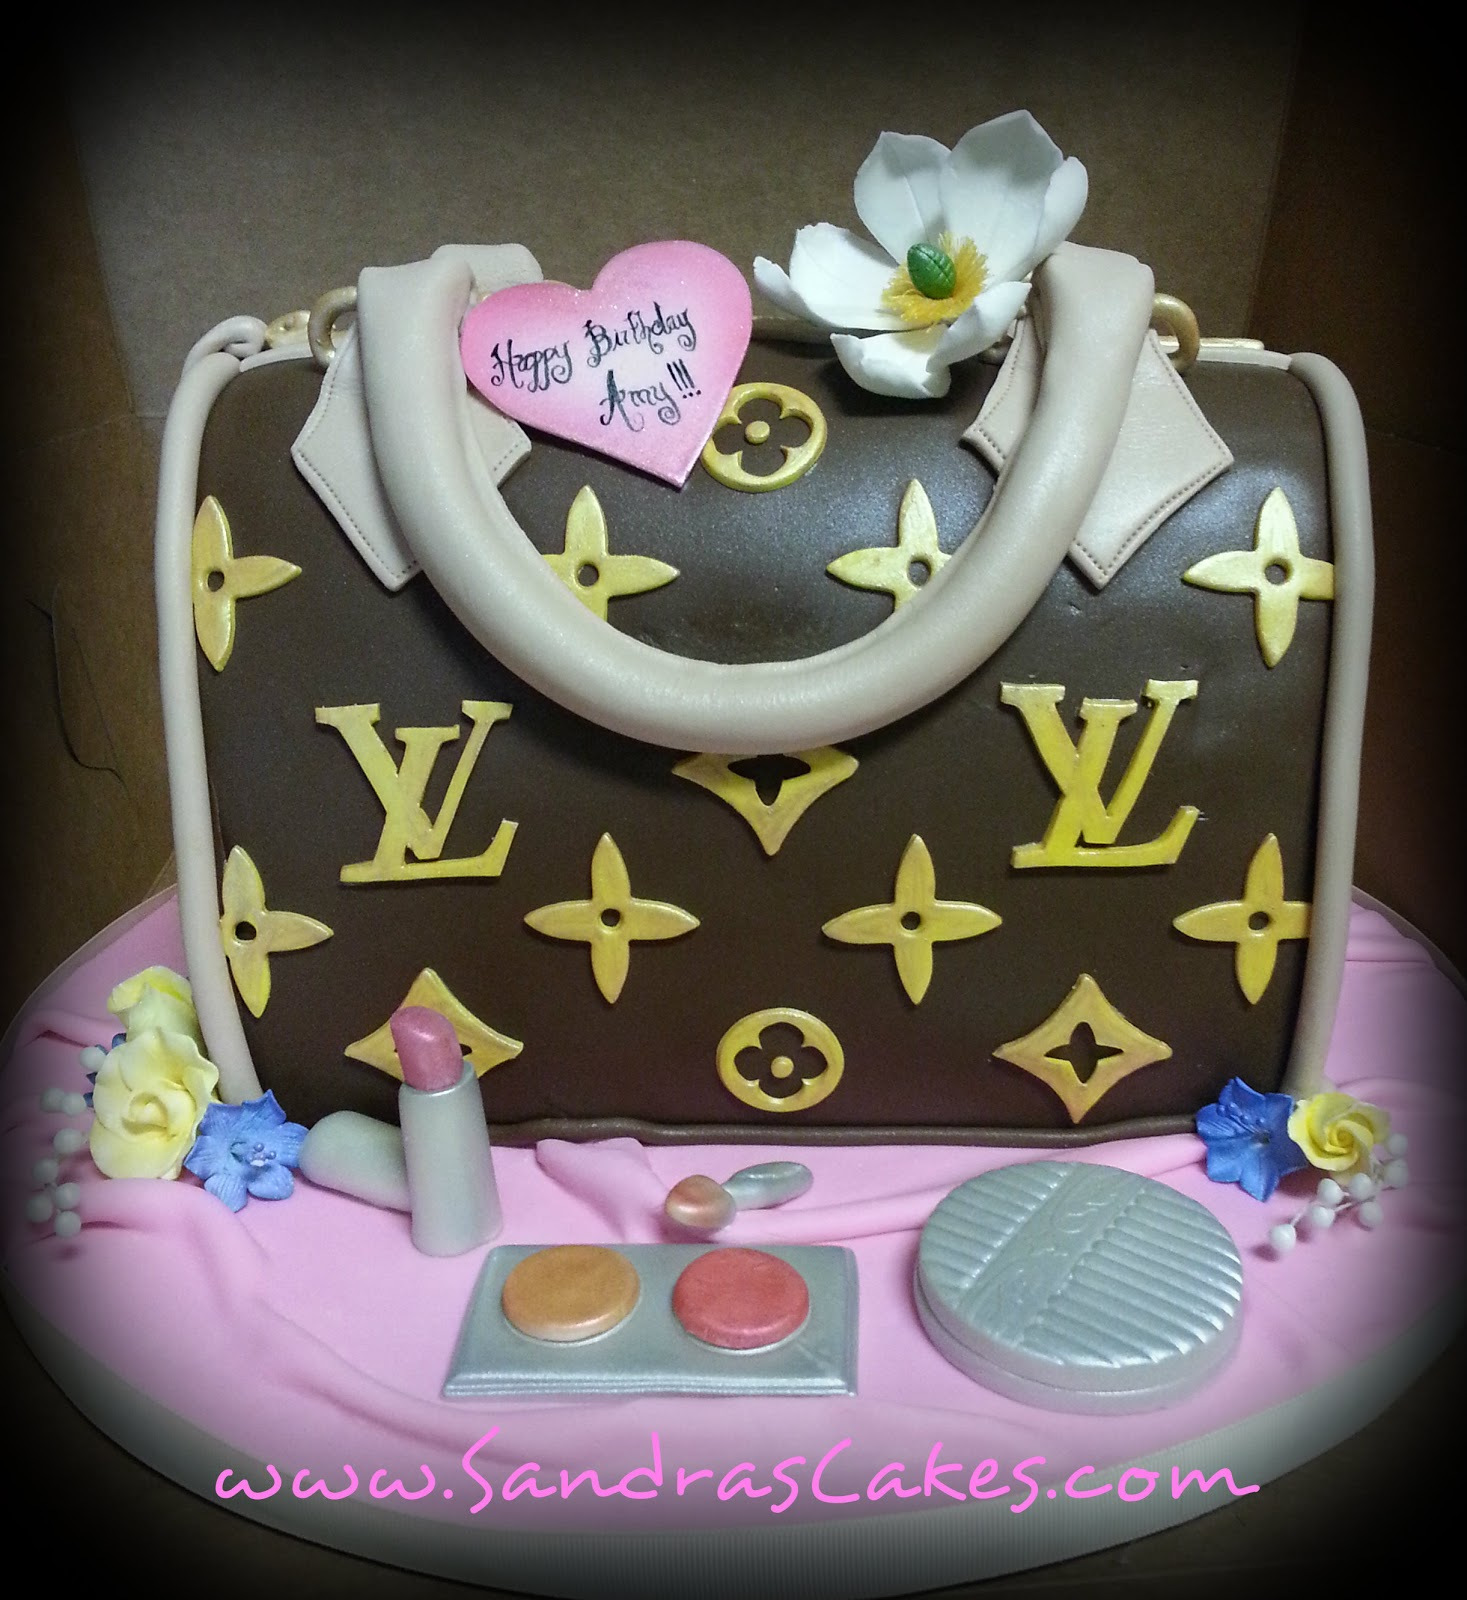 On Birthday Cakes Designer Handbag